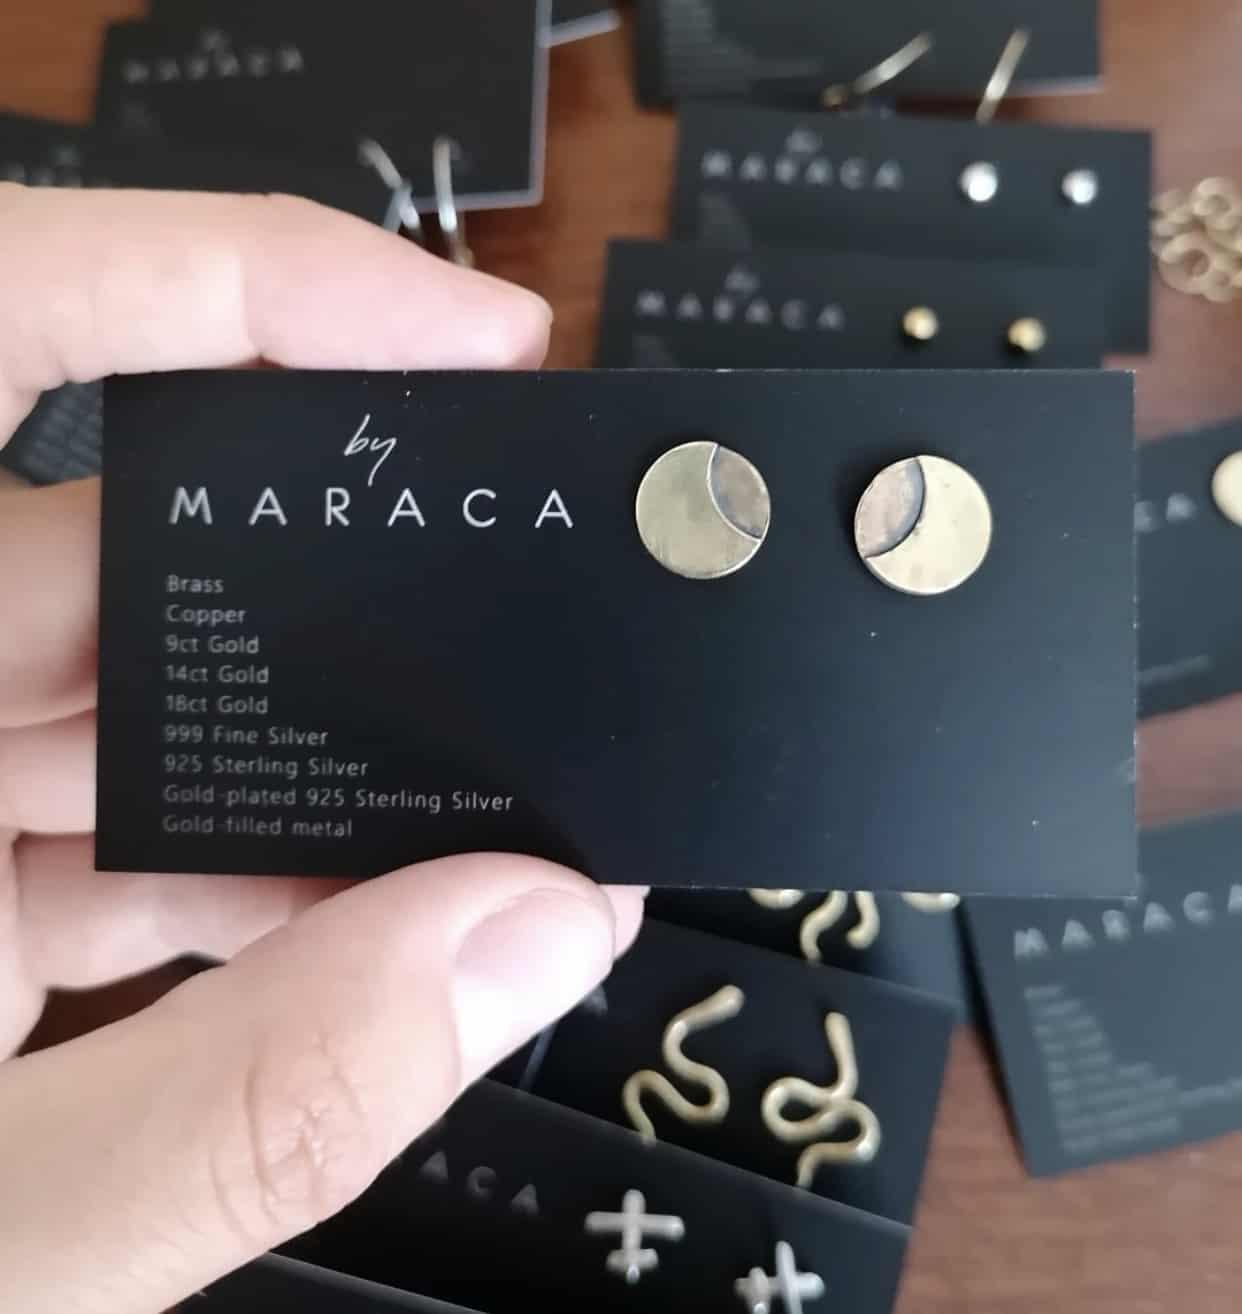 Faces behind the Business – Mareike - byMaraca